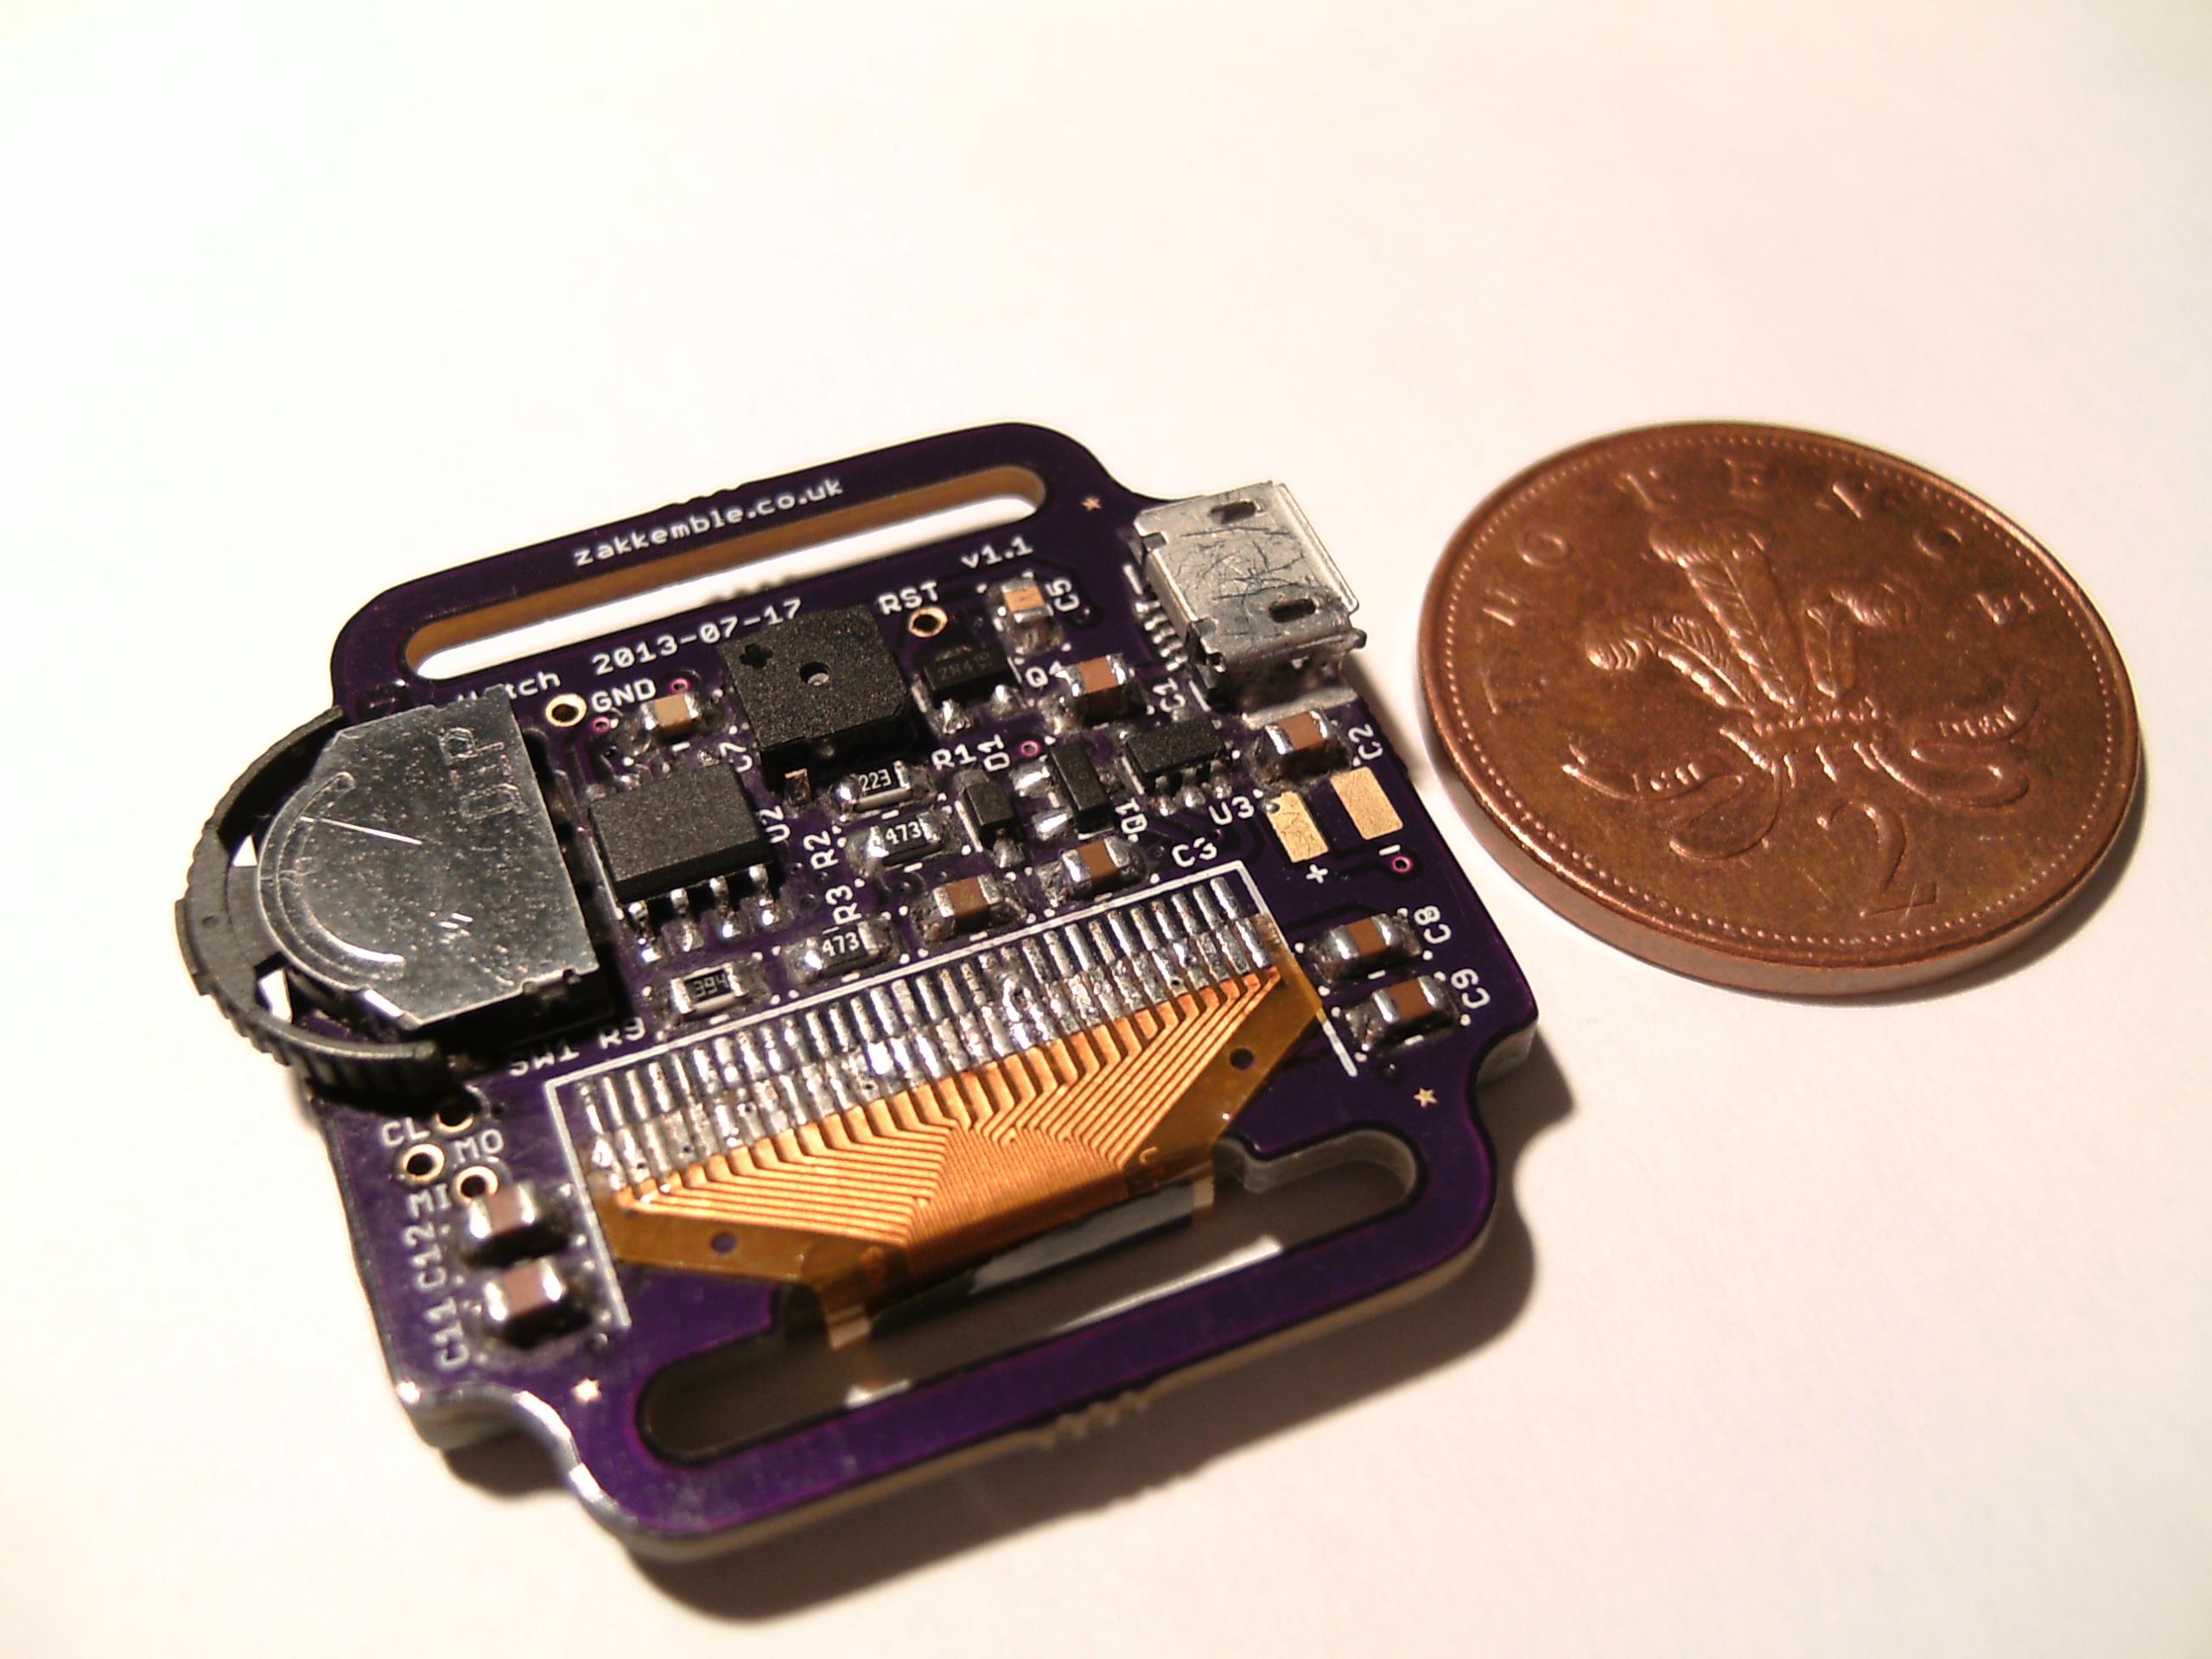 Diy Digital Wristwatch Zaks Electronics Blog Usb Player Circuit Diagram Also Pic Programmer On Avr Underside